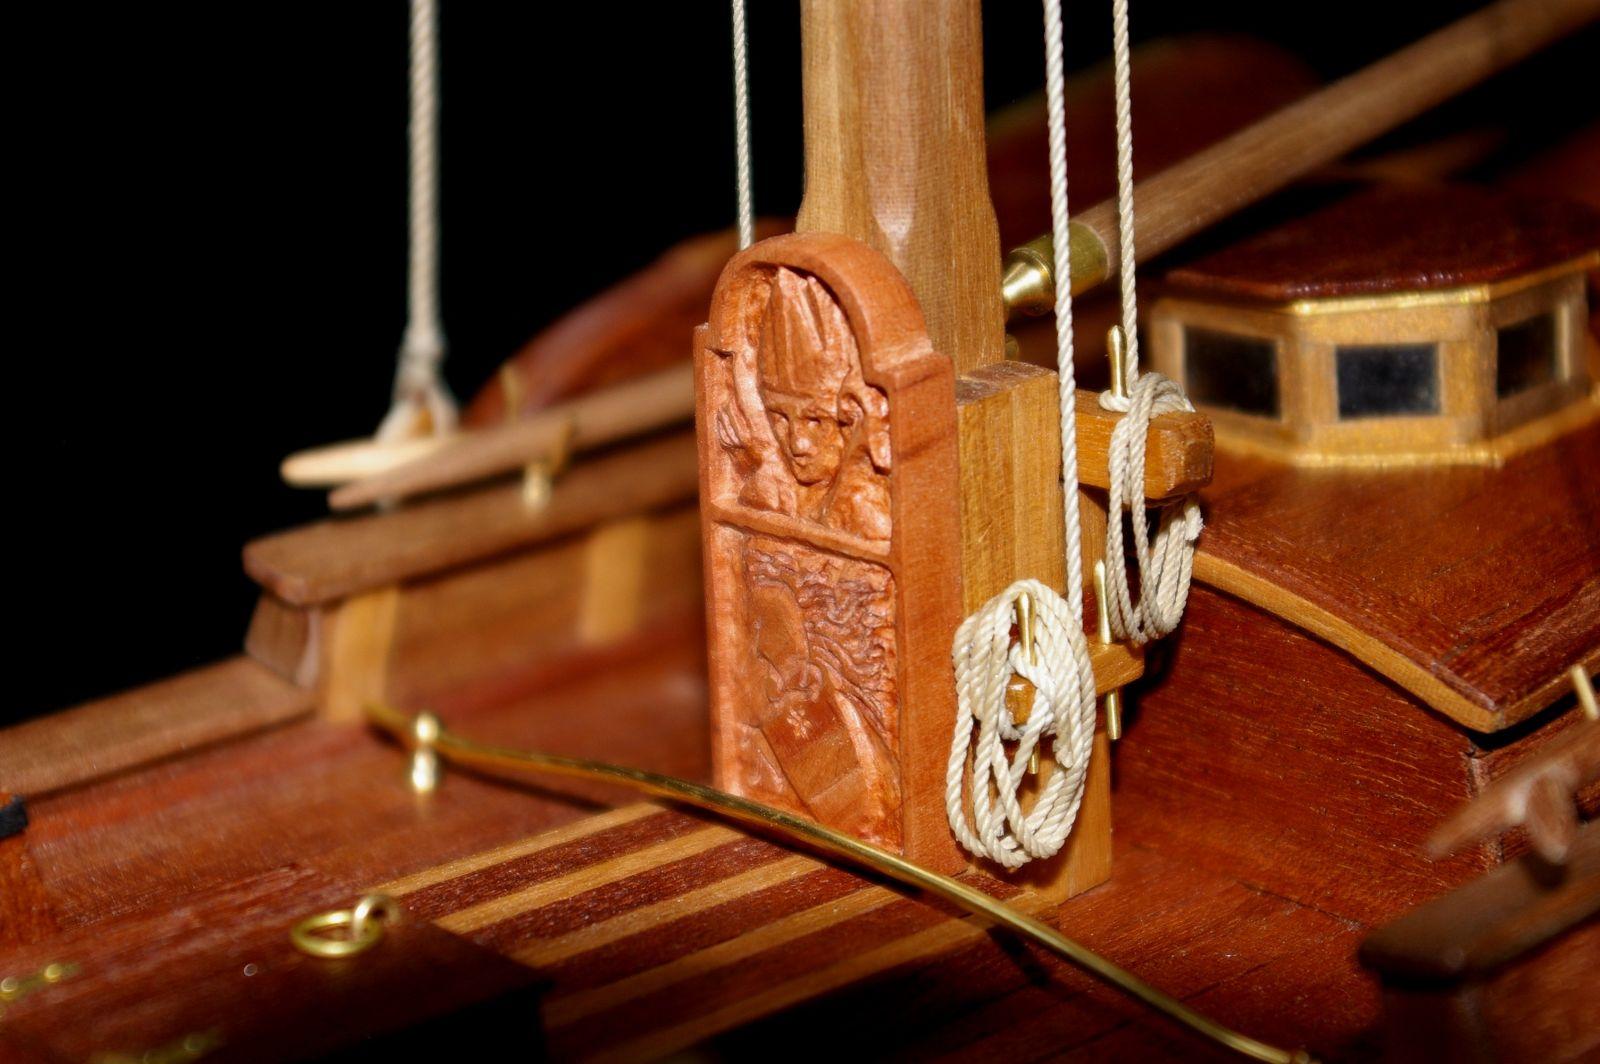 Mast board